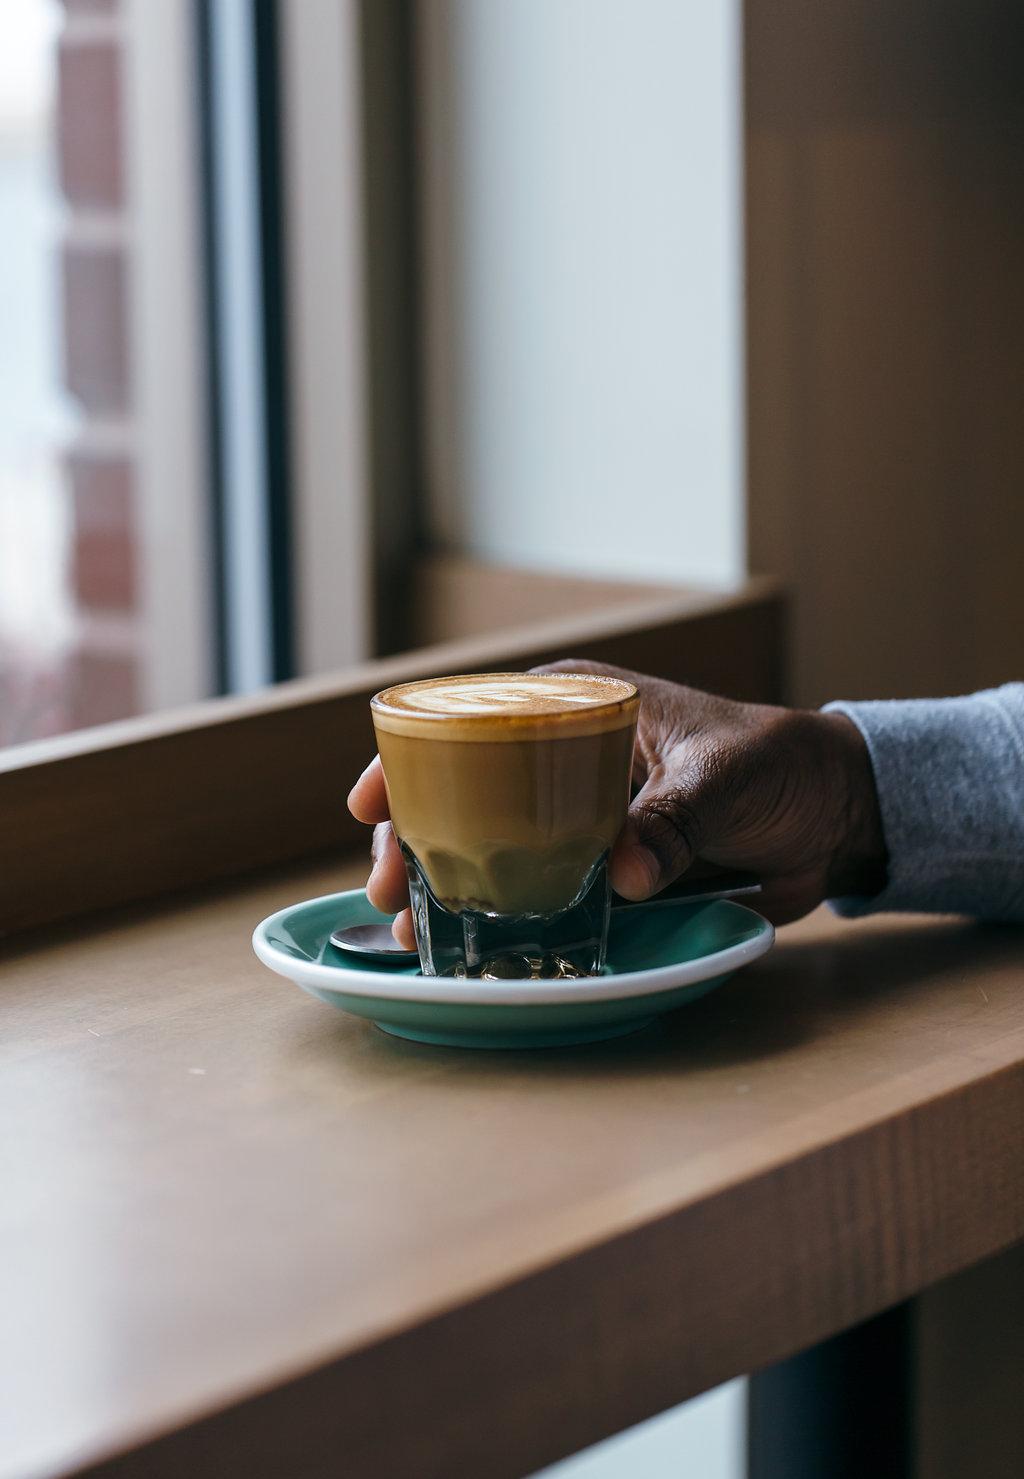 Malvern-Buttery-Coffee-_62A9141.jpg